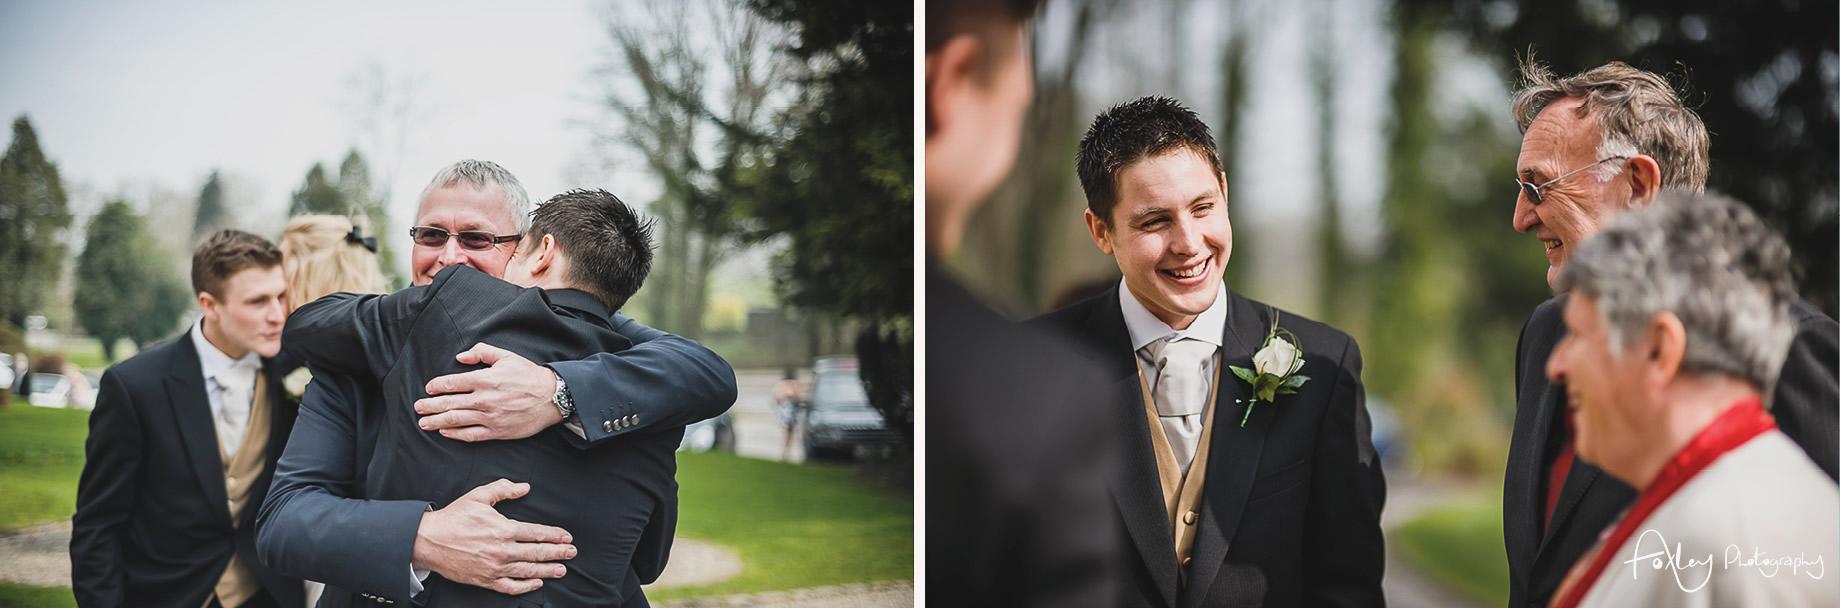 Gemma and Lewis' Wedding at Mitton Hall 058